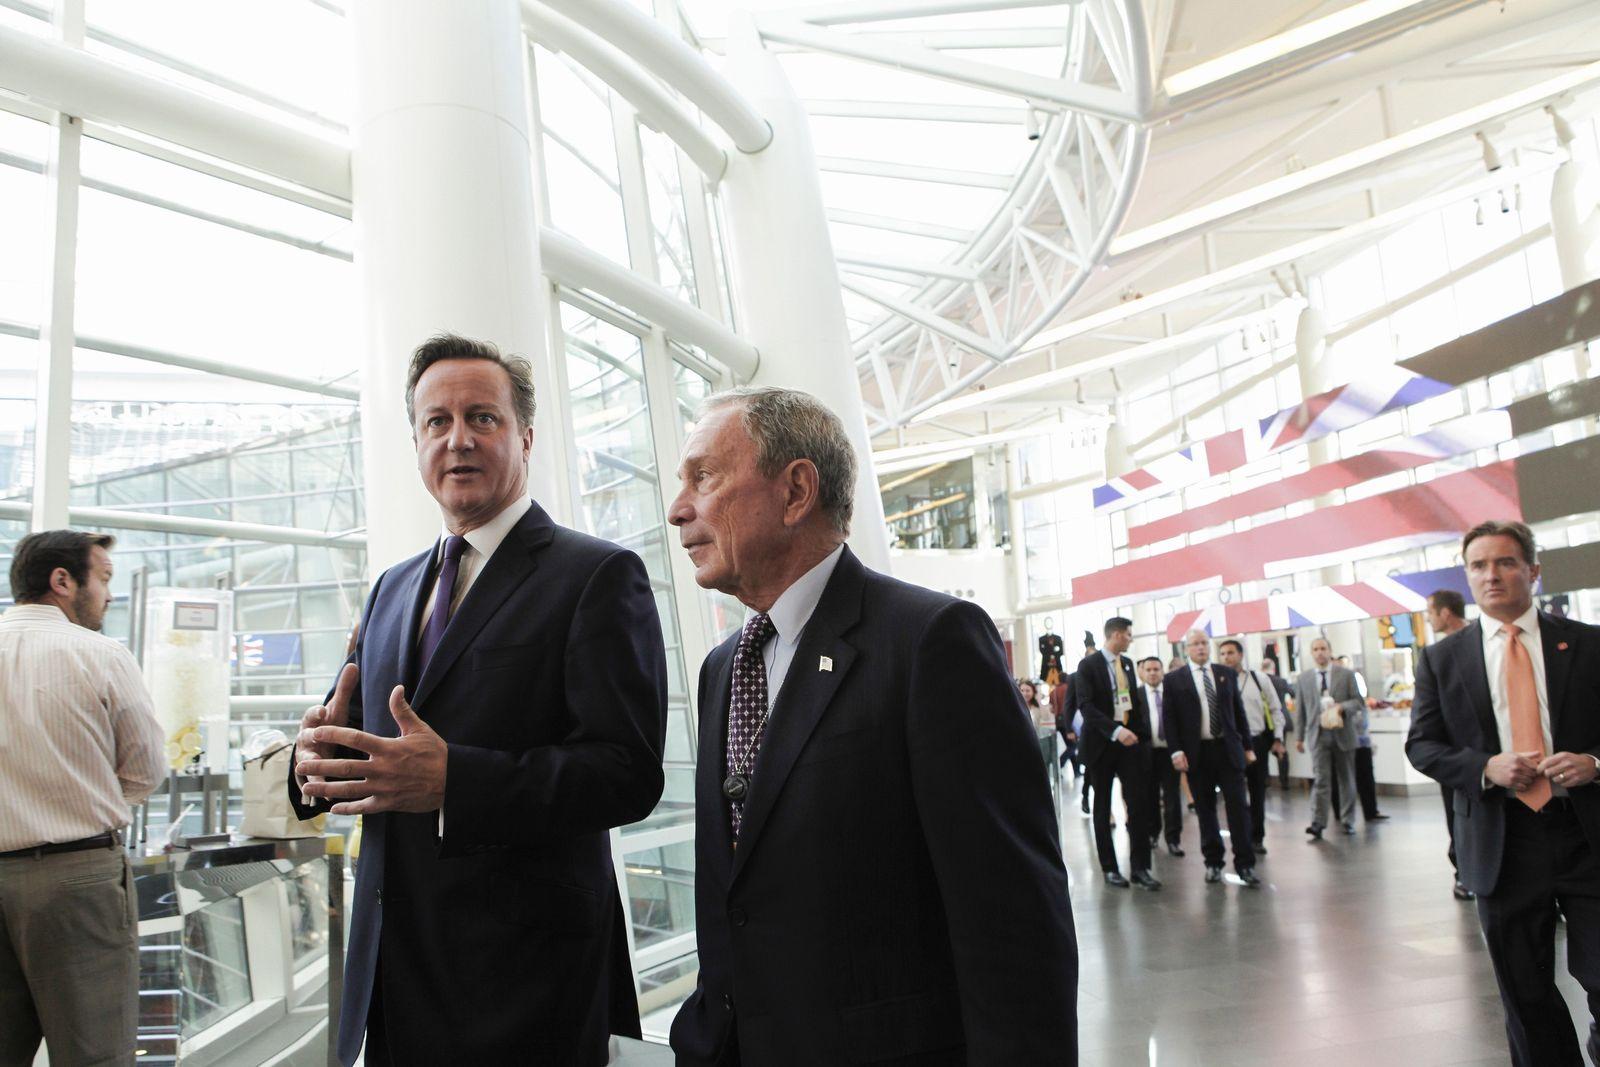 Cameron Bloomberg